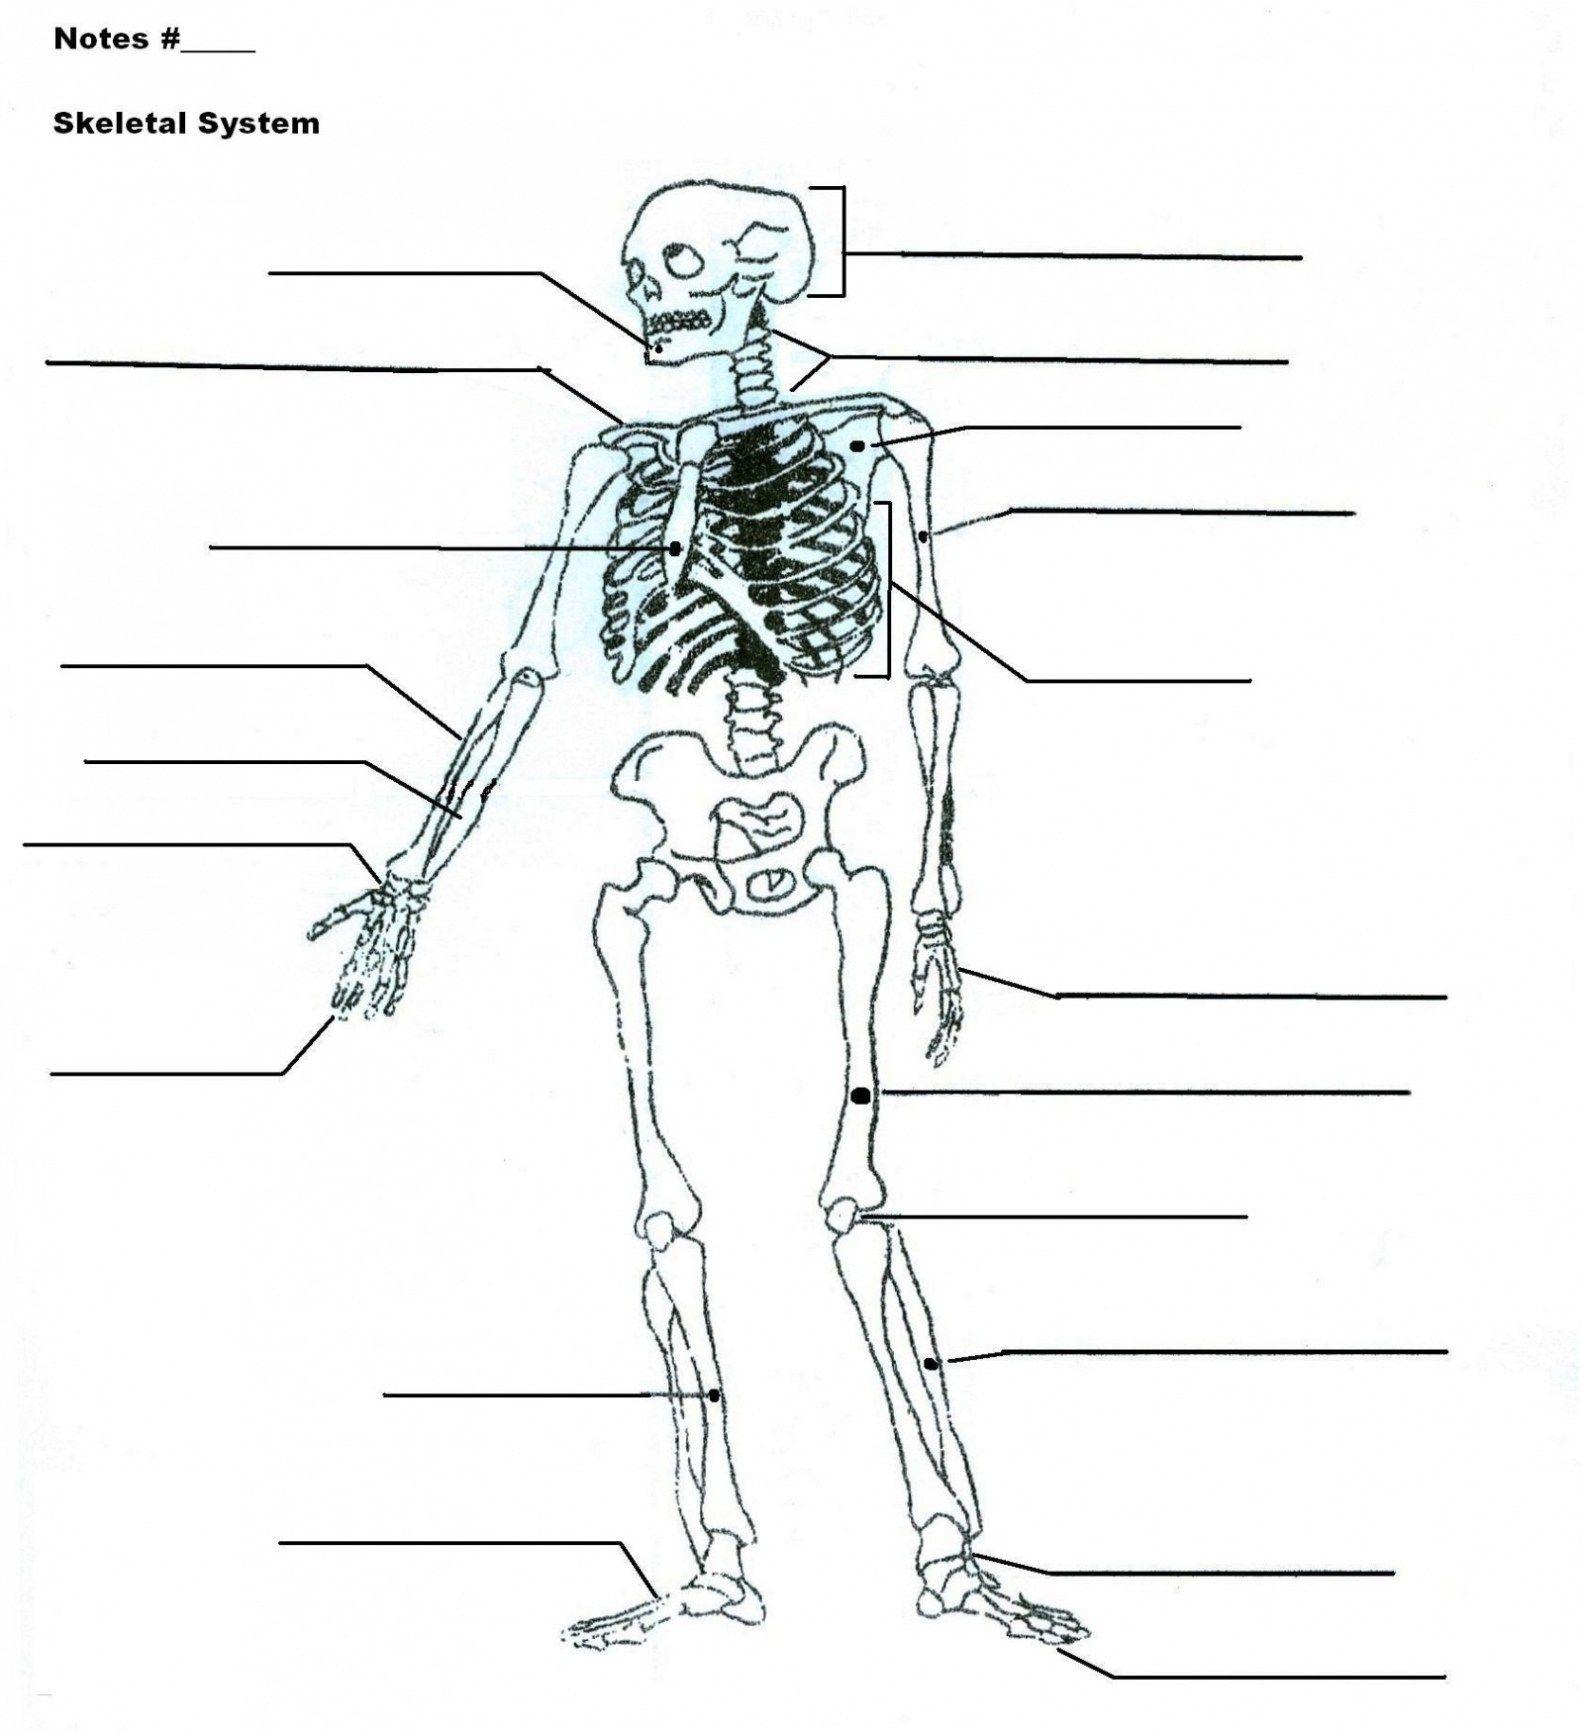 hight resolution of human skeleton diagram unlabeled human skeleton diagram unlabeled unlabeled skull diagram daytonva150